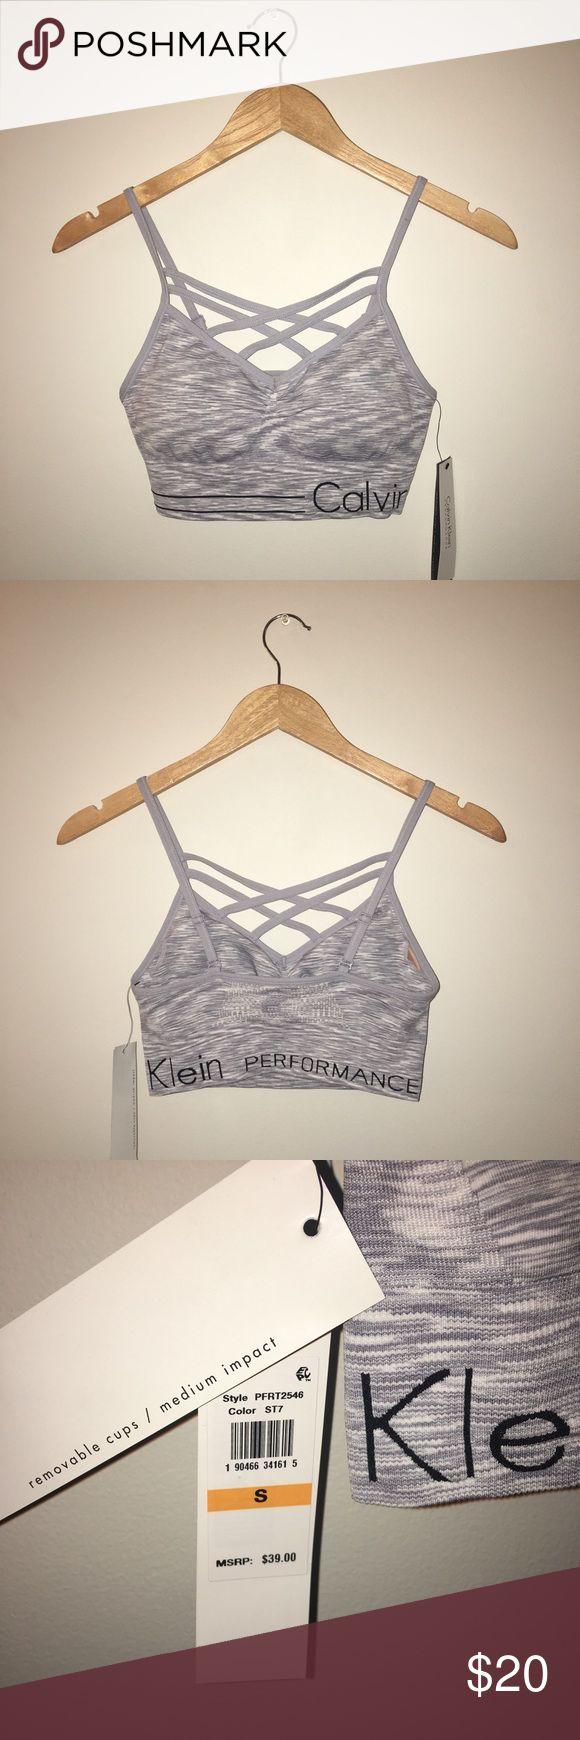 🎀sale🎀Calvin Klein sports bra Medium impact sport bra with removable pads. New with tag, never worn Calvin Klein Intimates & Sleepwear Bras